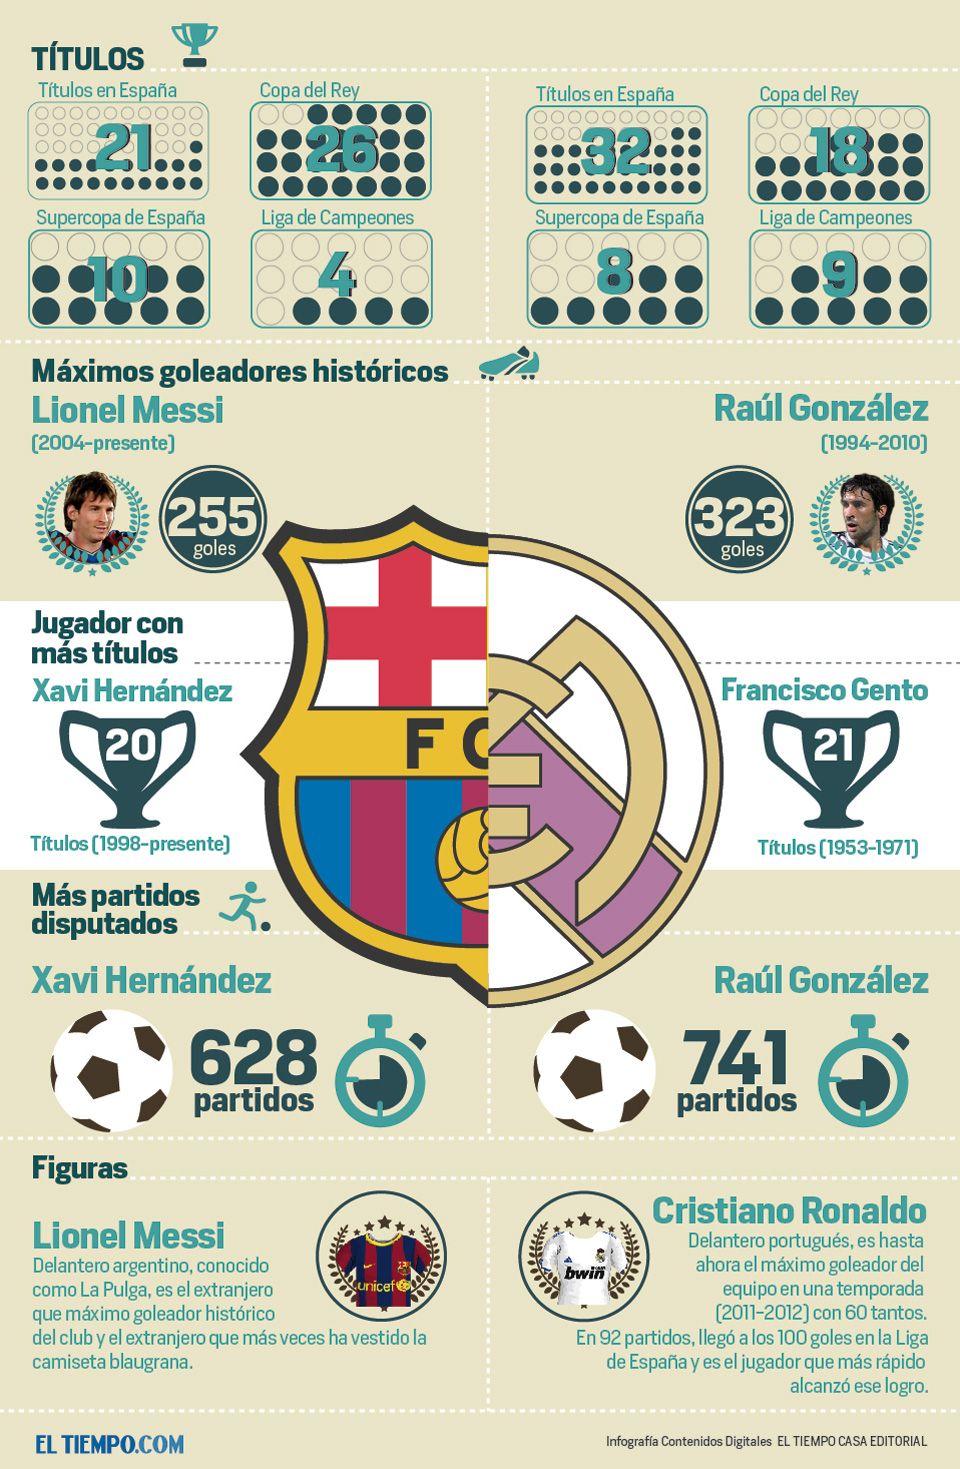 real madrid vs barcelona the team i hate versus the team i love